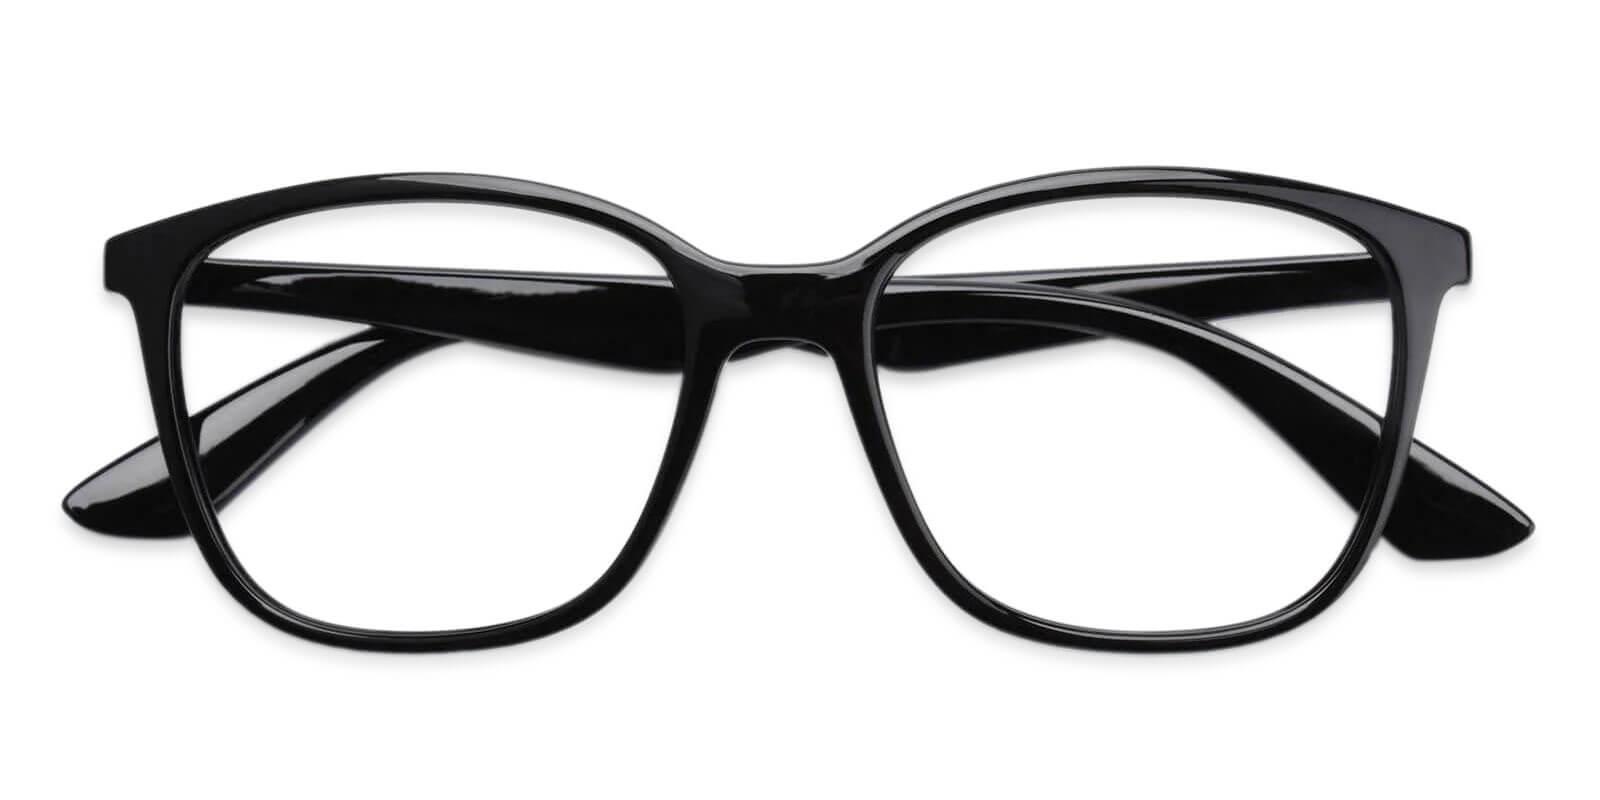 Northern Black TR Eyeglasses , UniversalBridgeFit Frames from ABBE Glasses